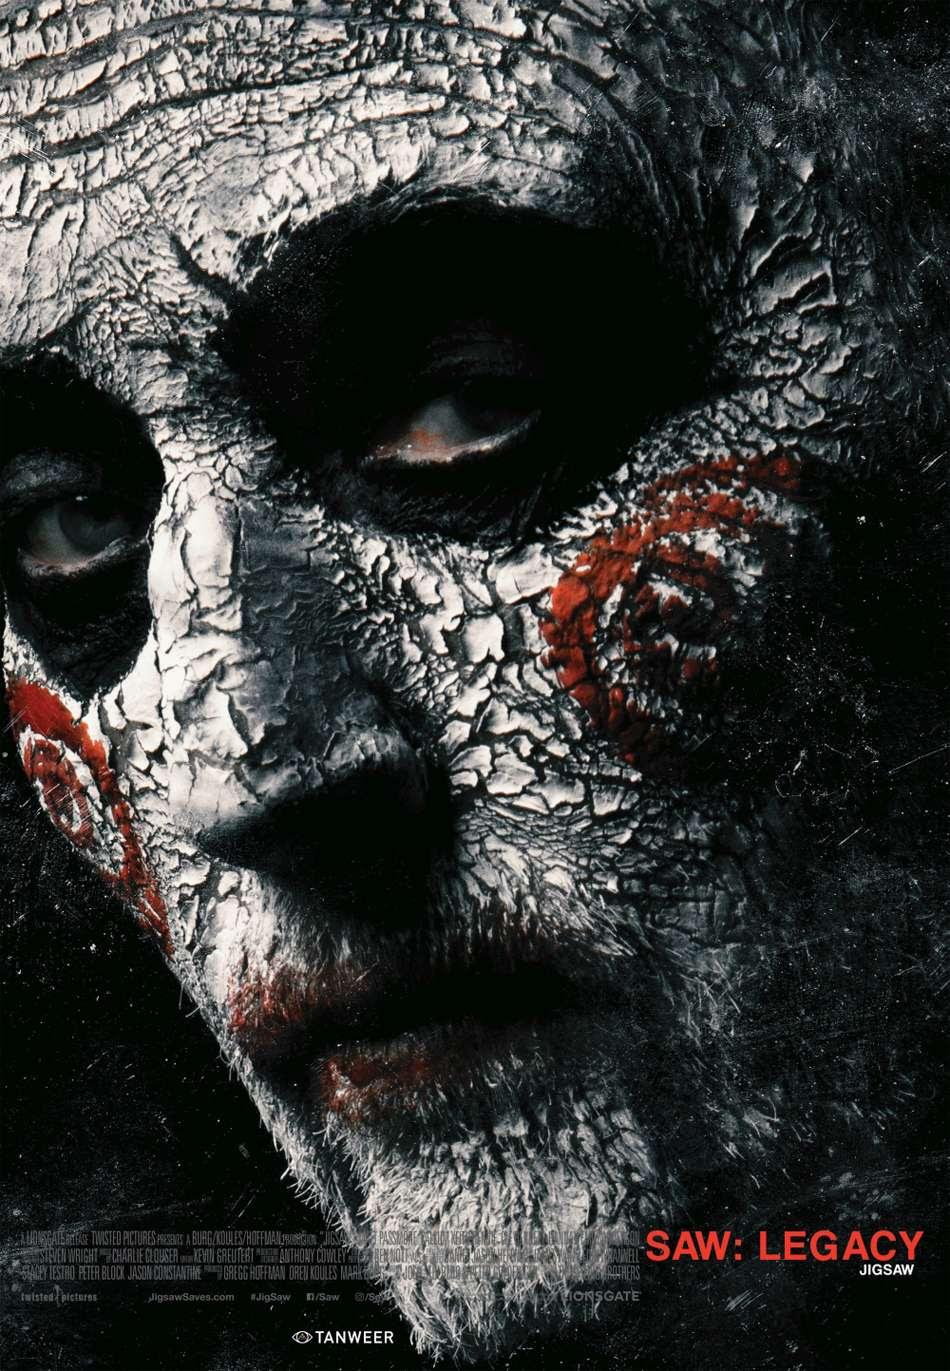 Saw: Legacy (Jigsaw) Poster Πόστερ